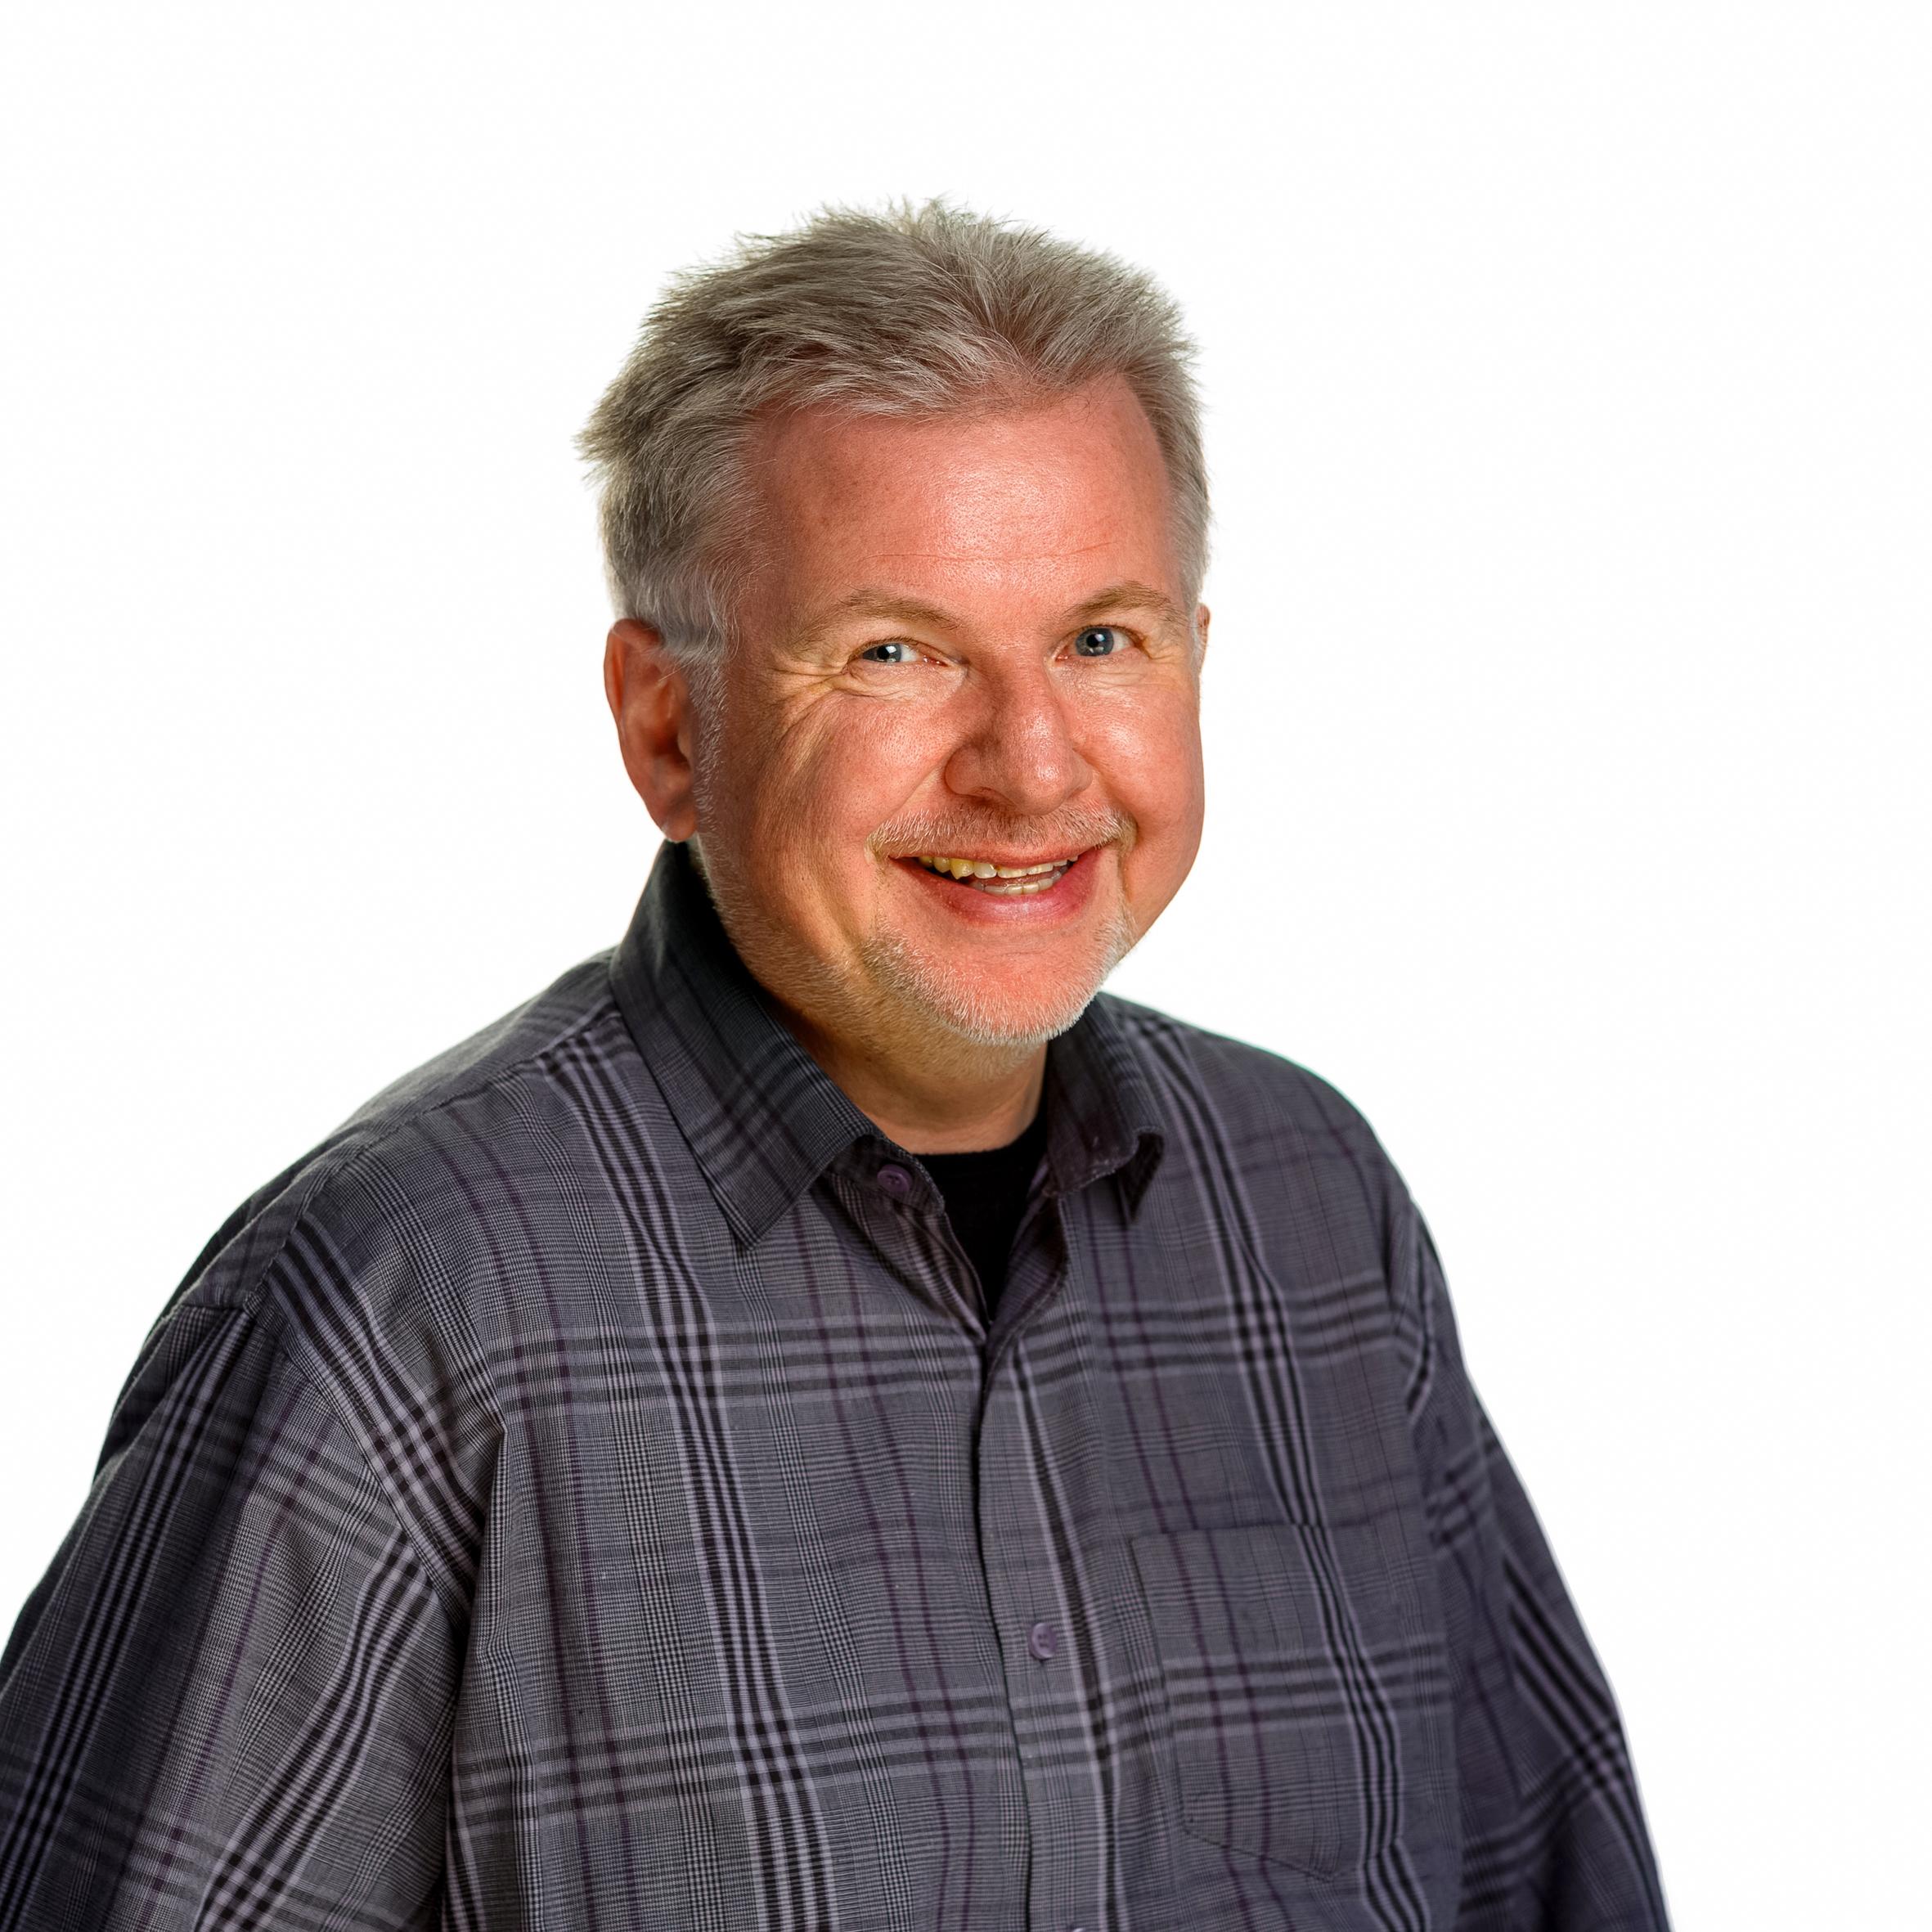 Lars Edvin Bru